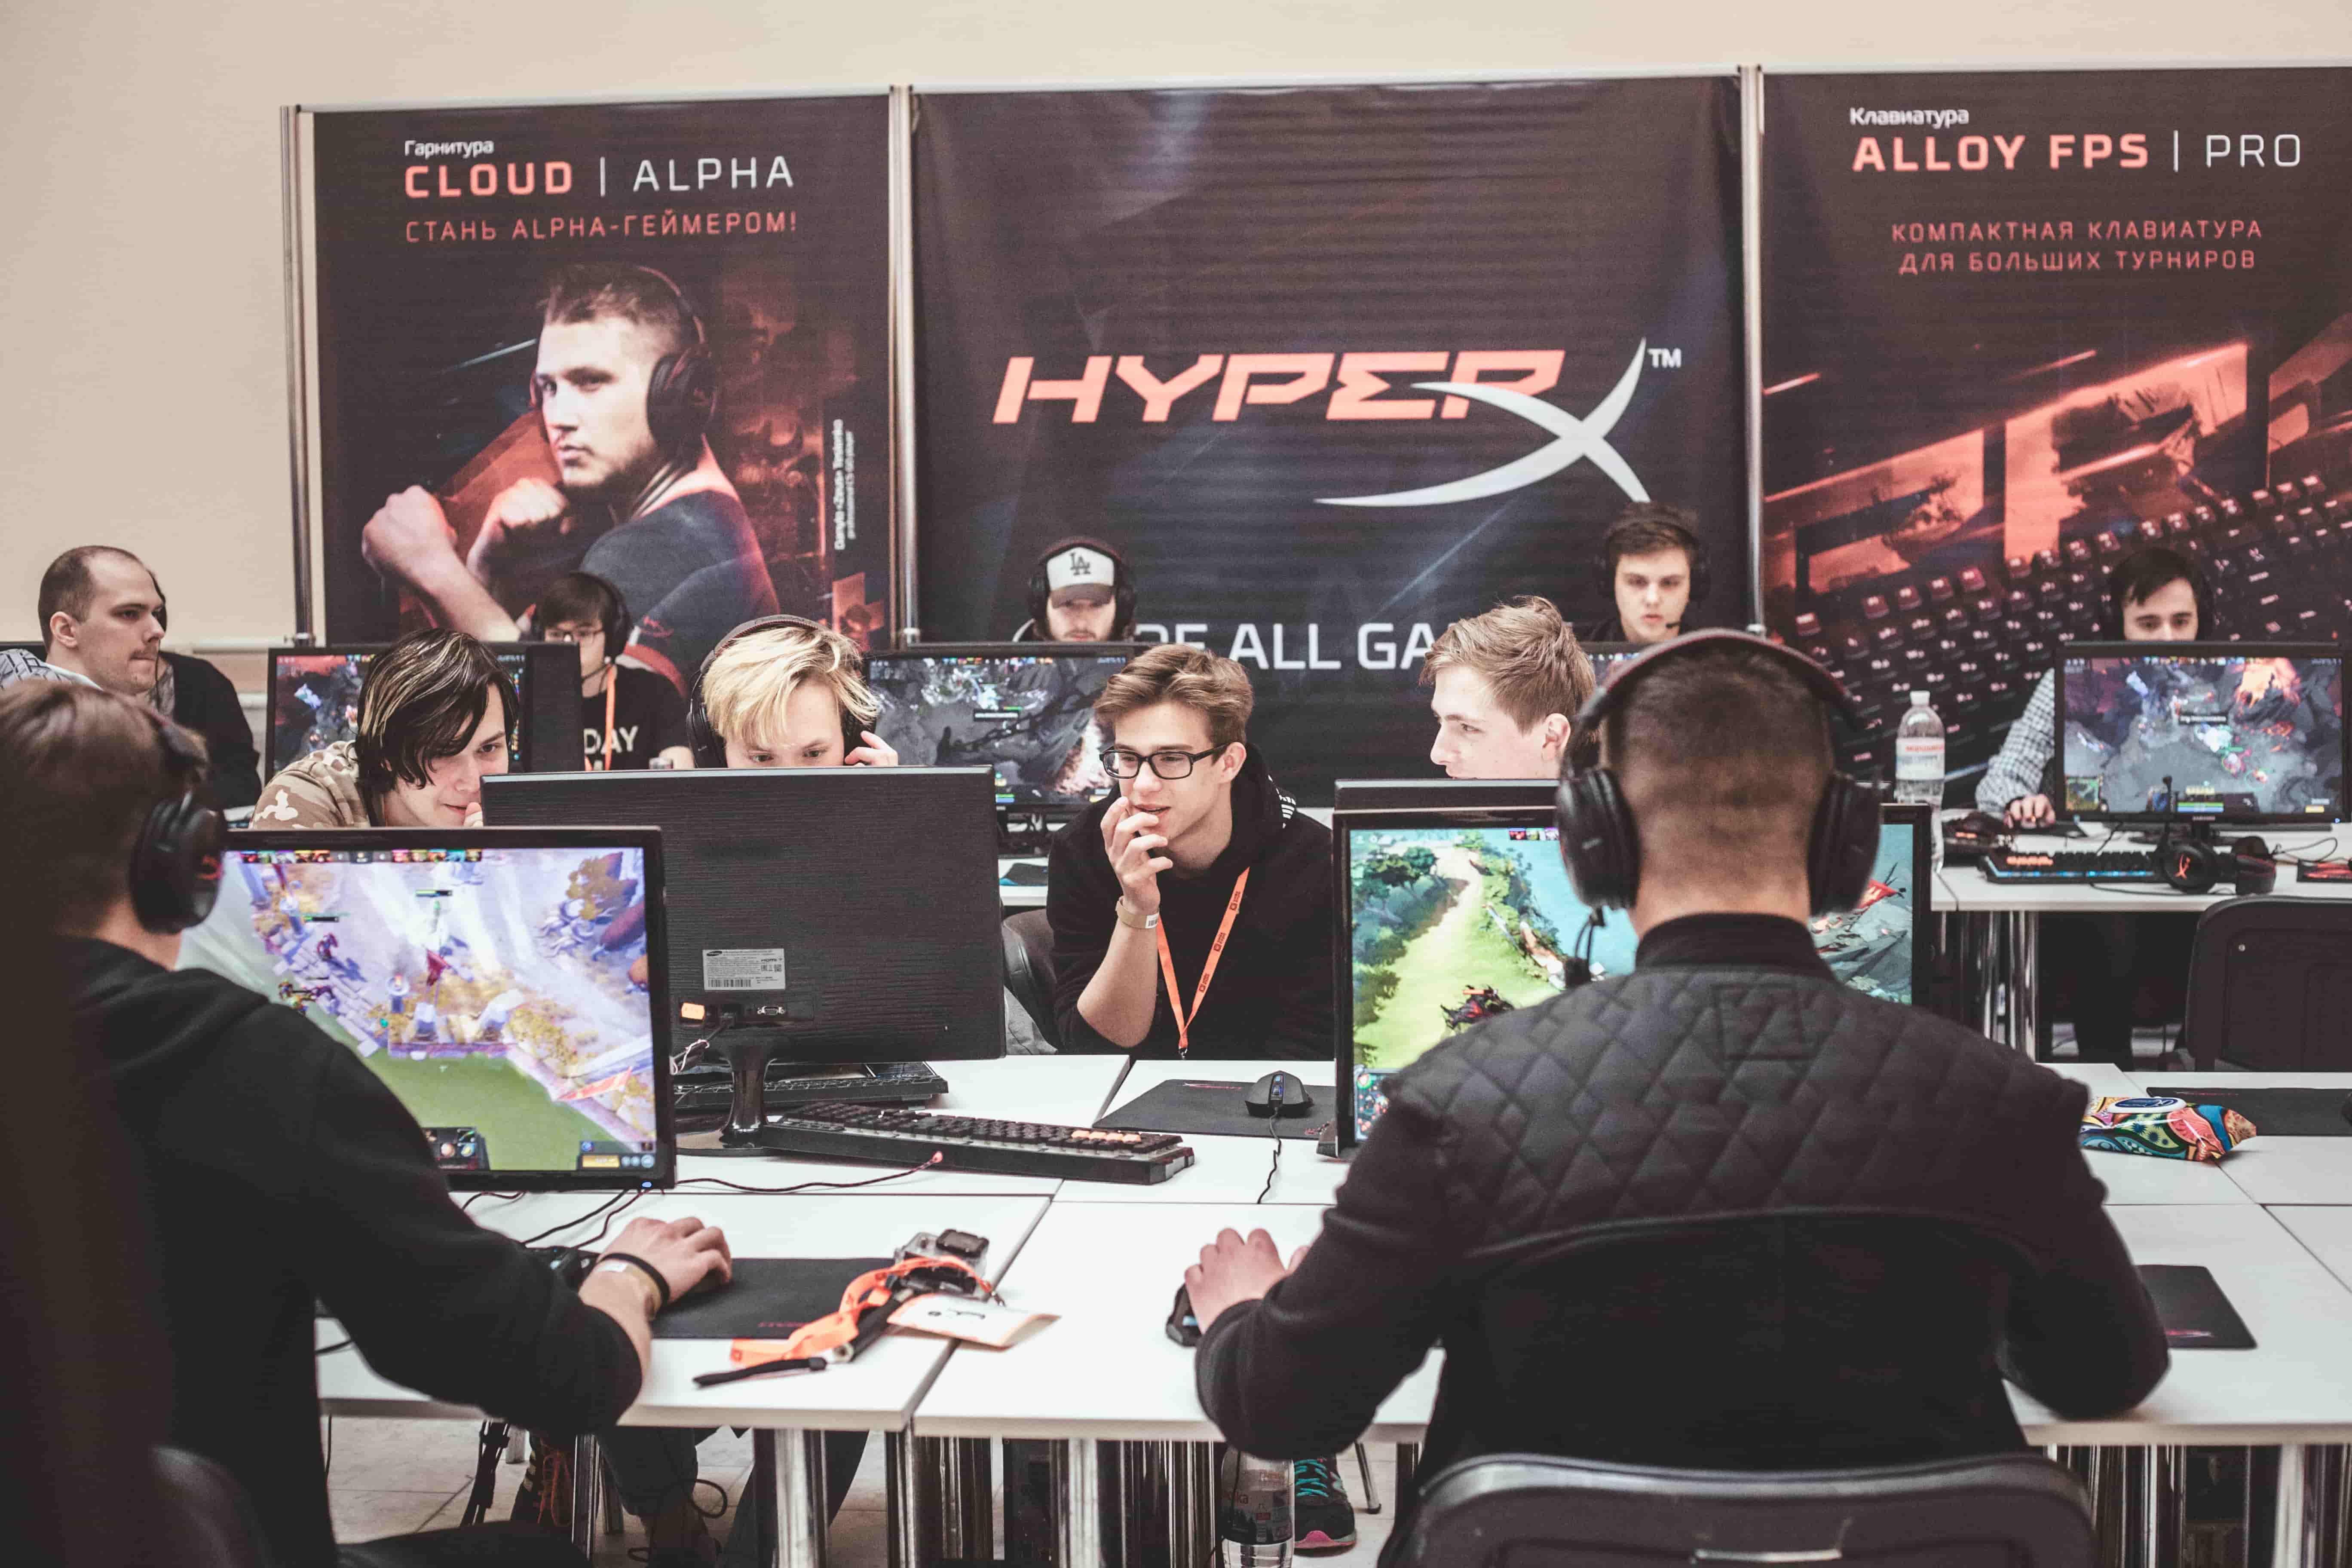 WeGame 5.0 eSports Festival in Kiev 2019 | Cybersport Tournament in Ukraine - 3